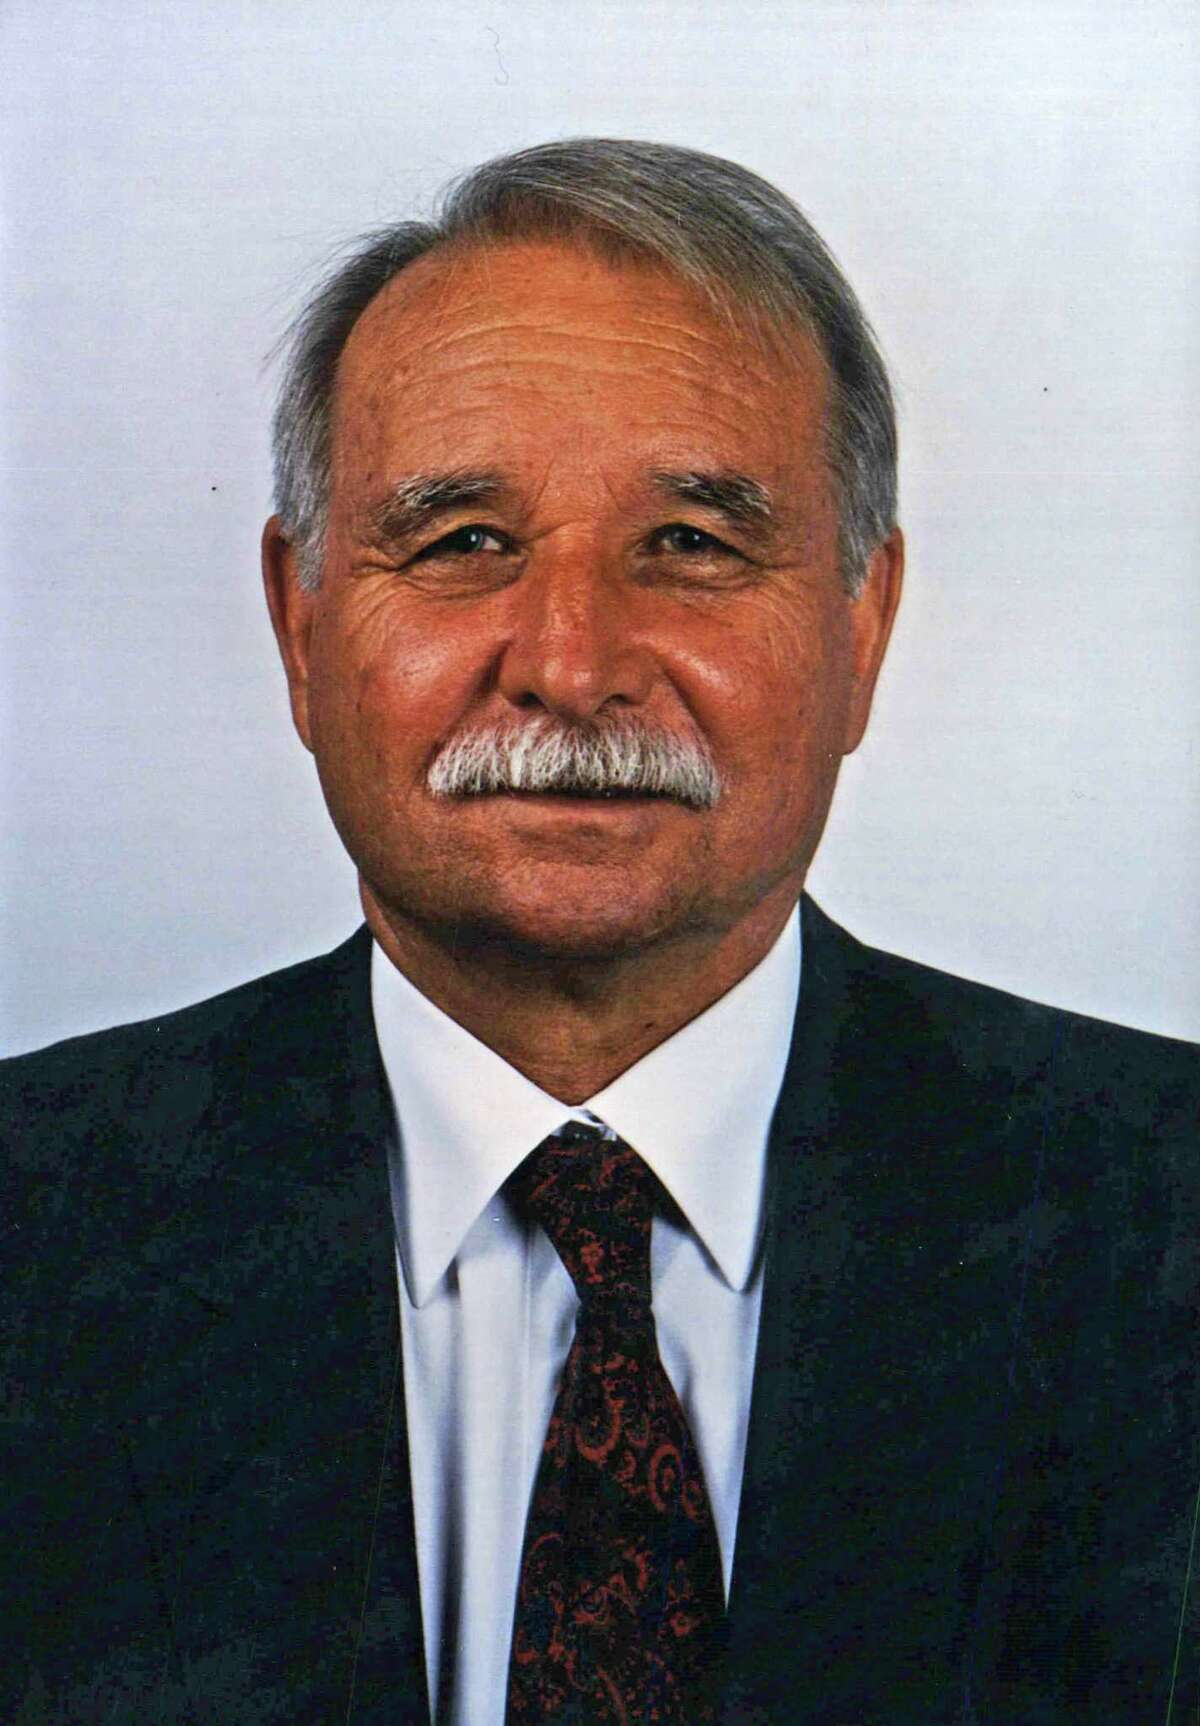 Thoams H. Friedkin, Gulf States Toyota